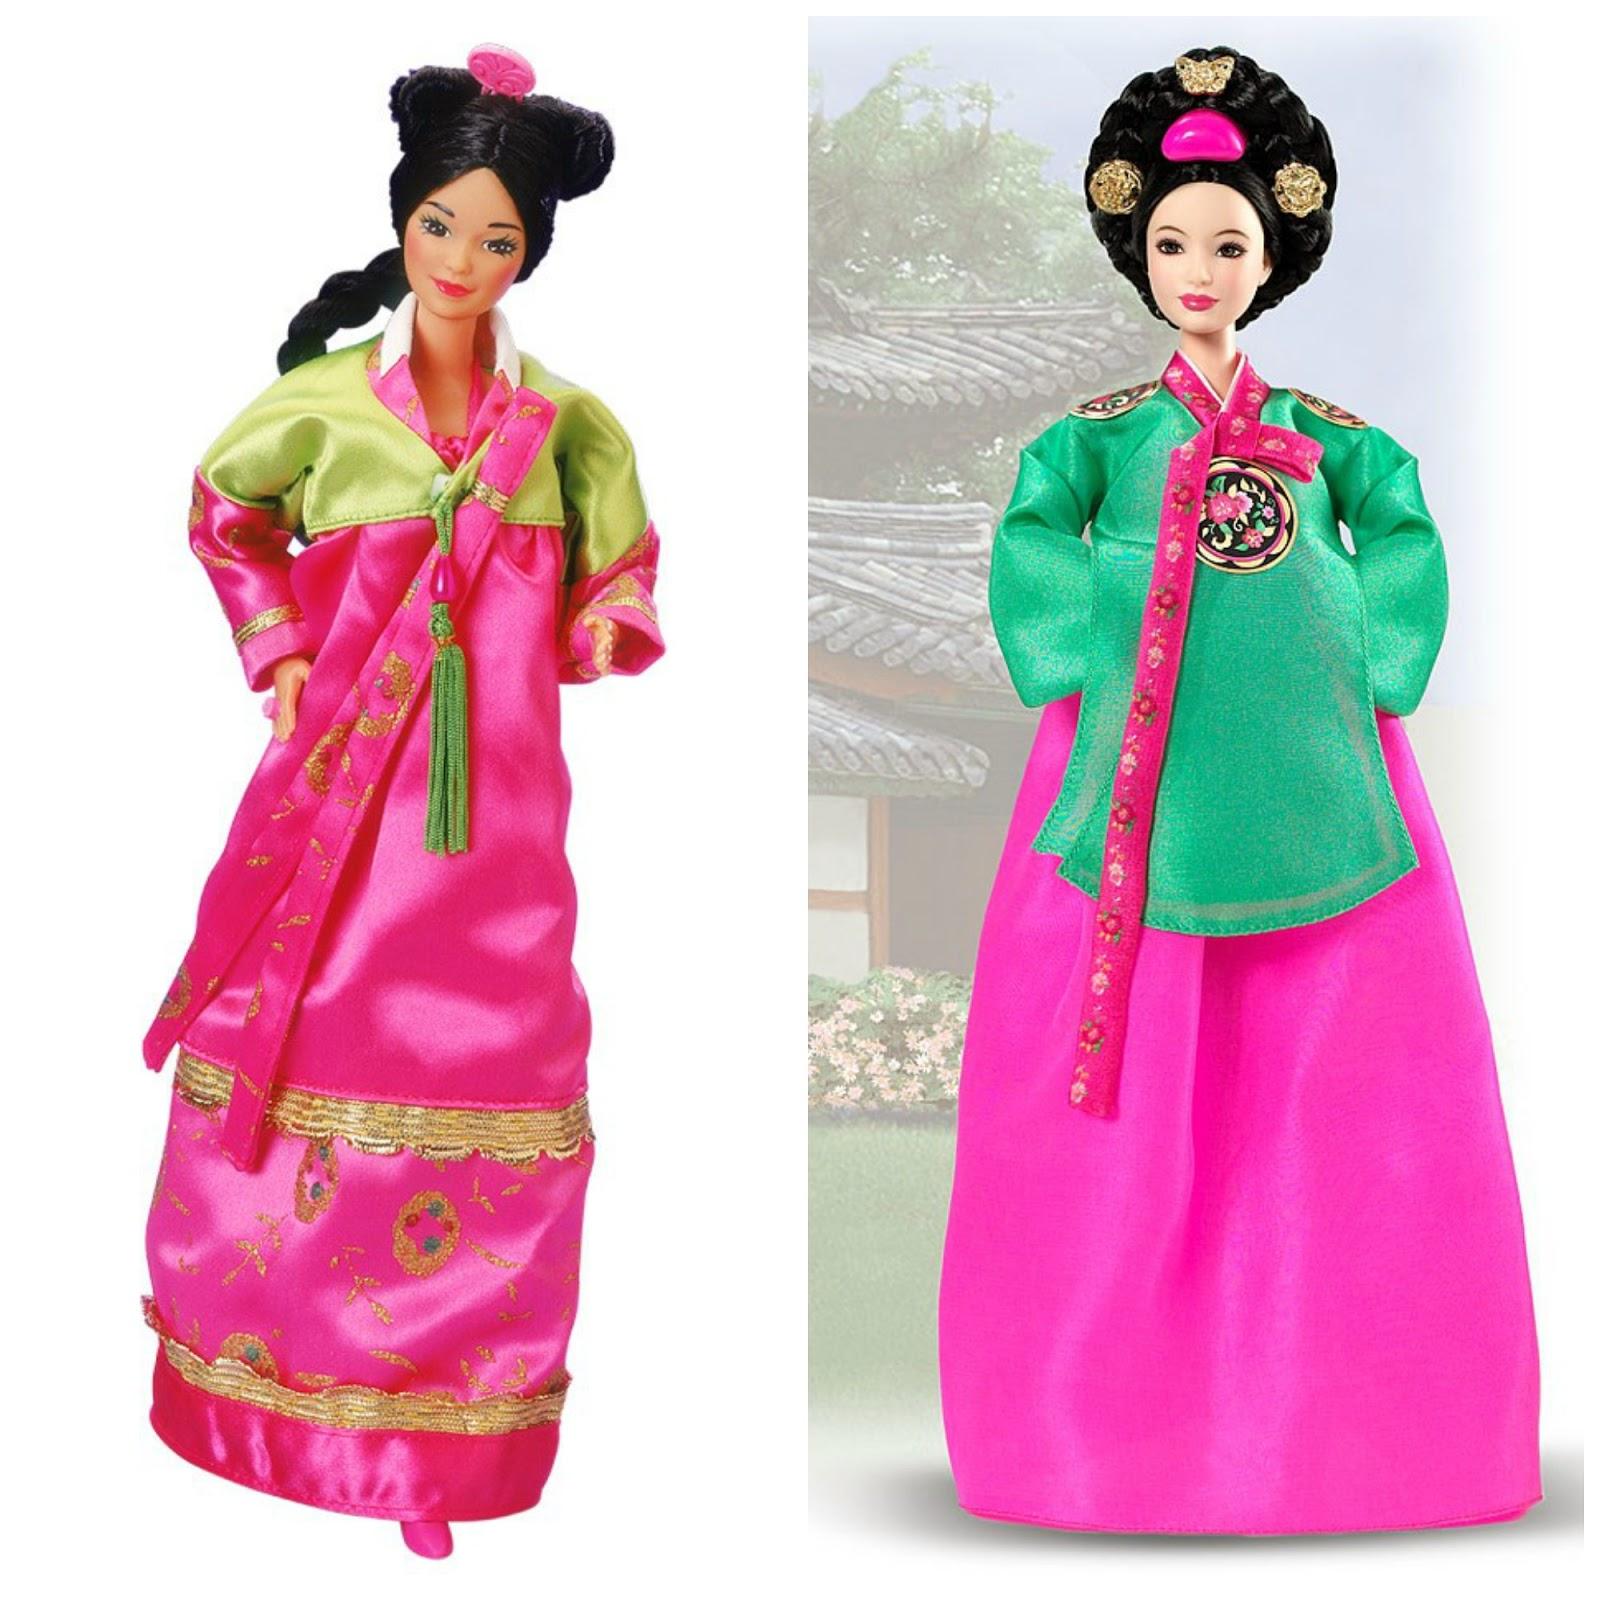 Barbie coreana